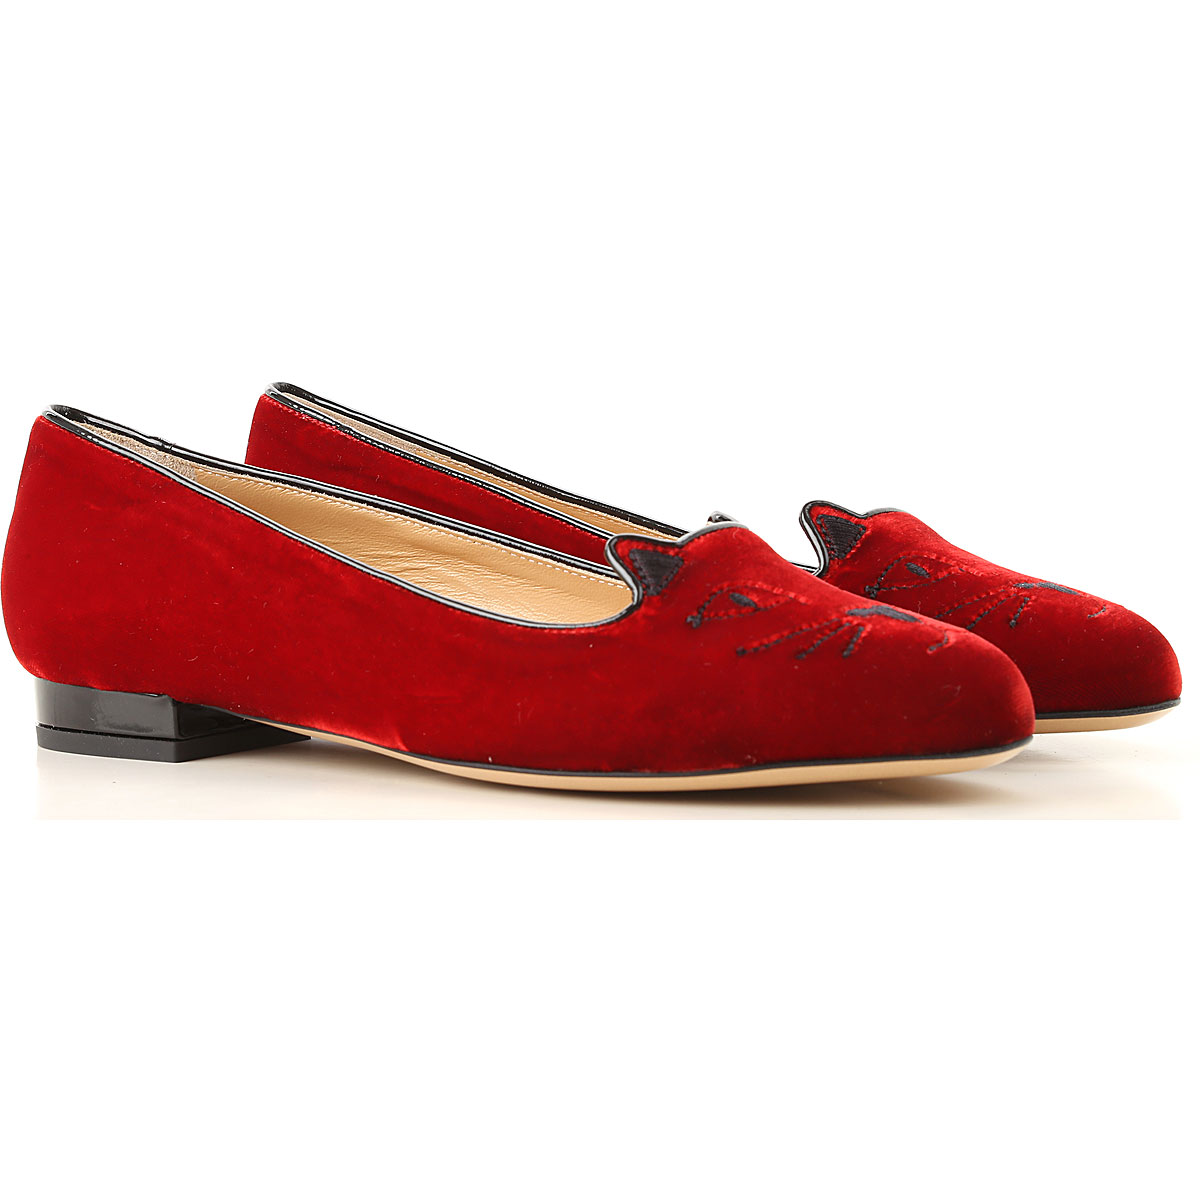 Image of Charlotte Olympia Ballet Flats Ballerina Shoes for Women, Bloody Red, Velvet, 2017, 6 7 8 9